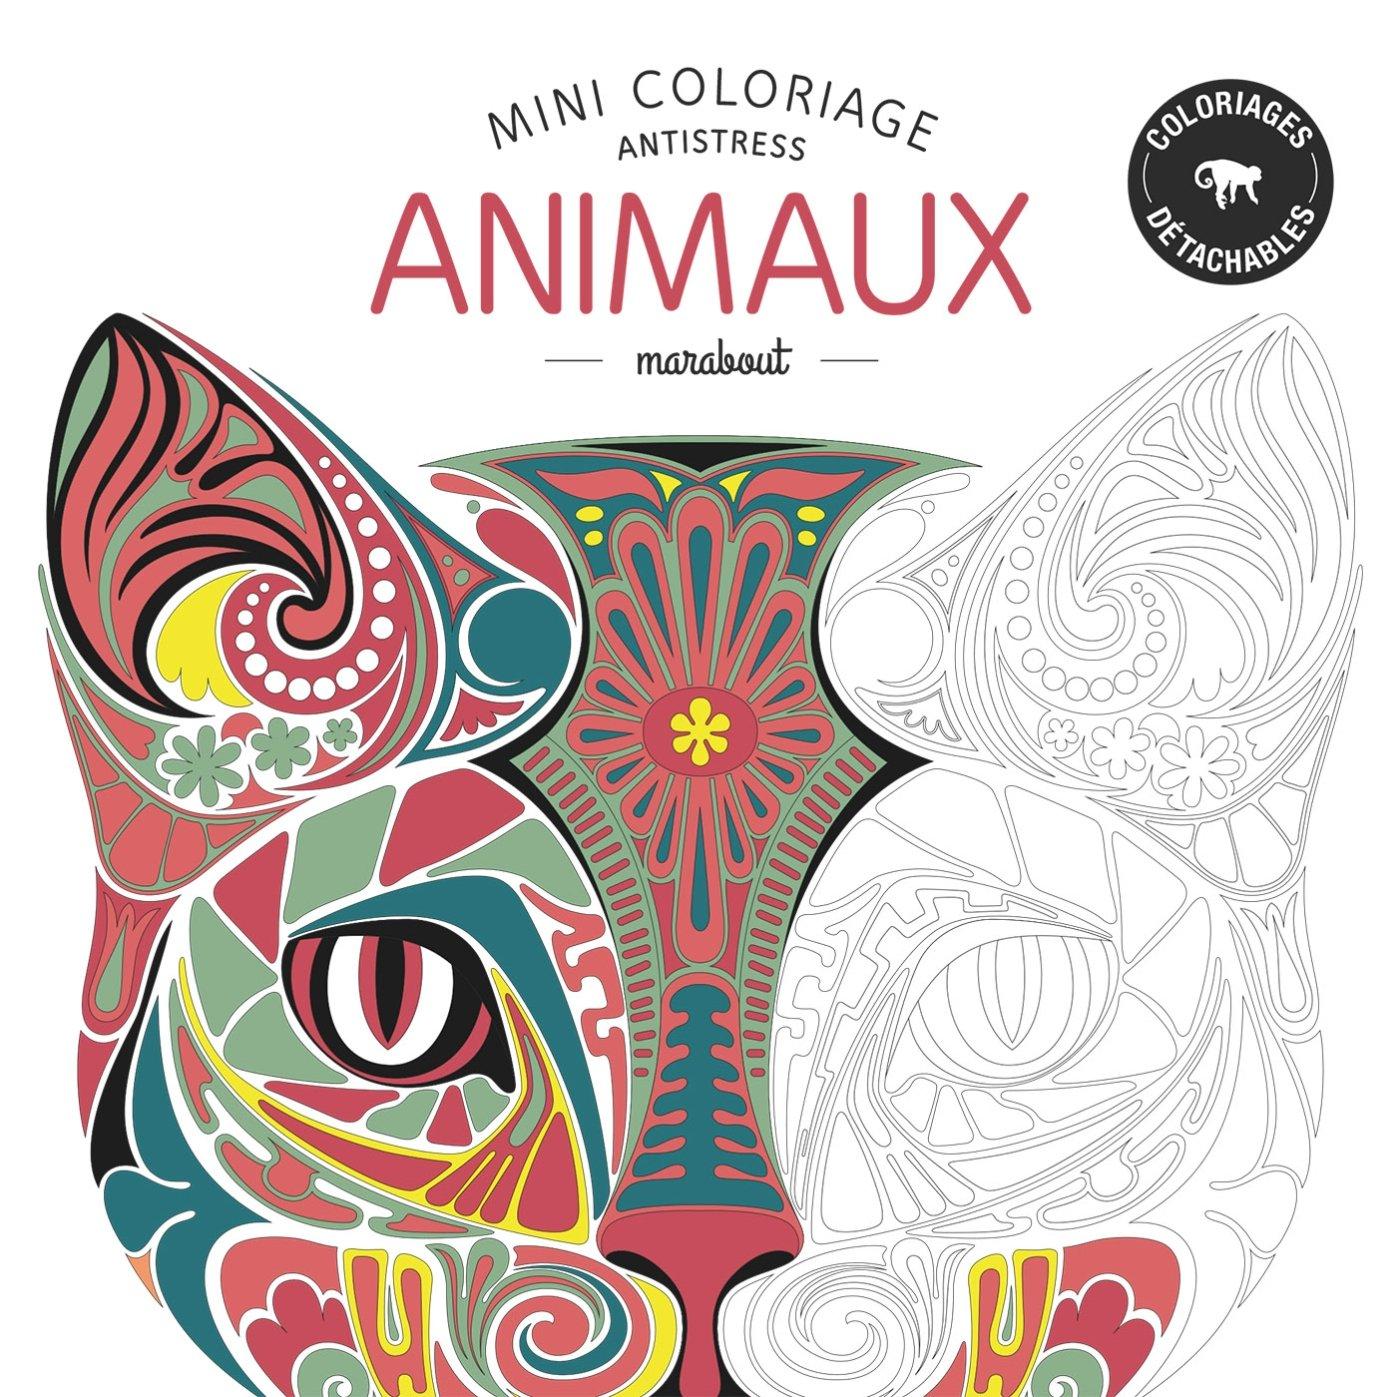 Mini Coloriage Anti Stress Animaux French Edition